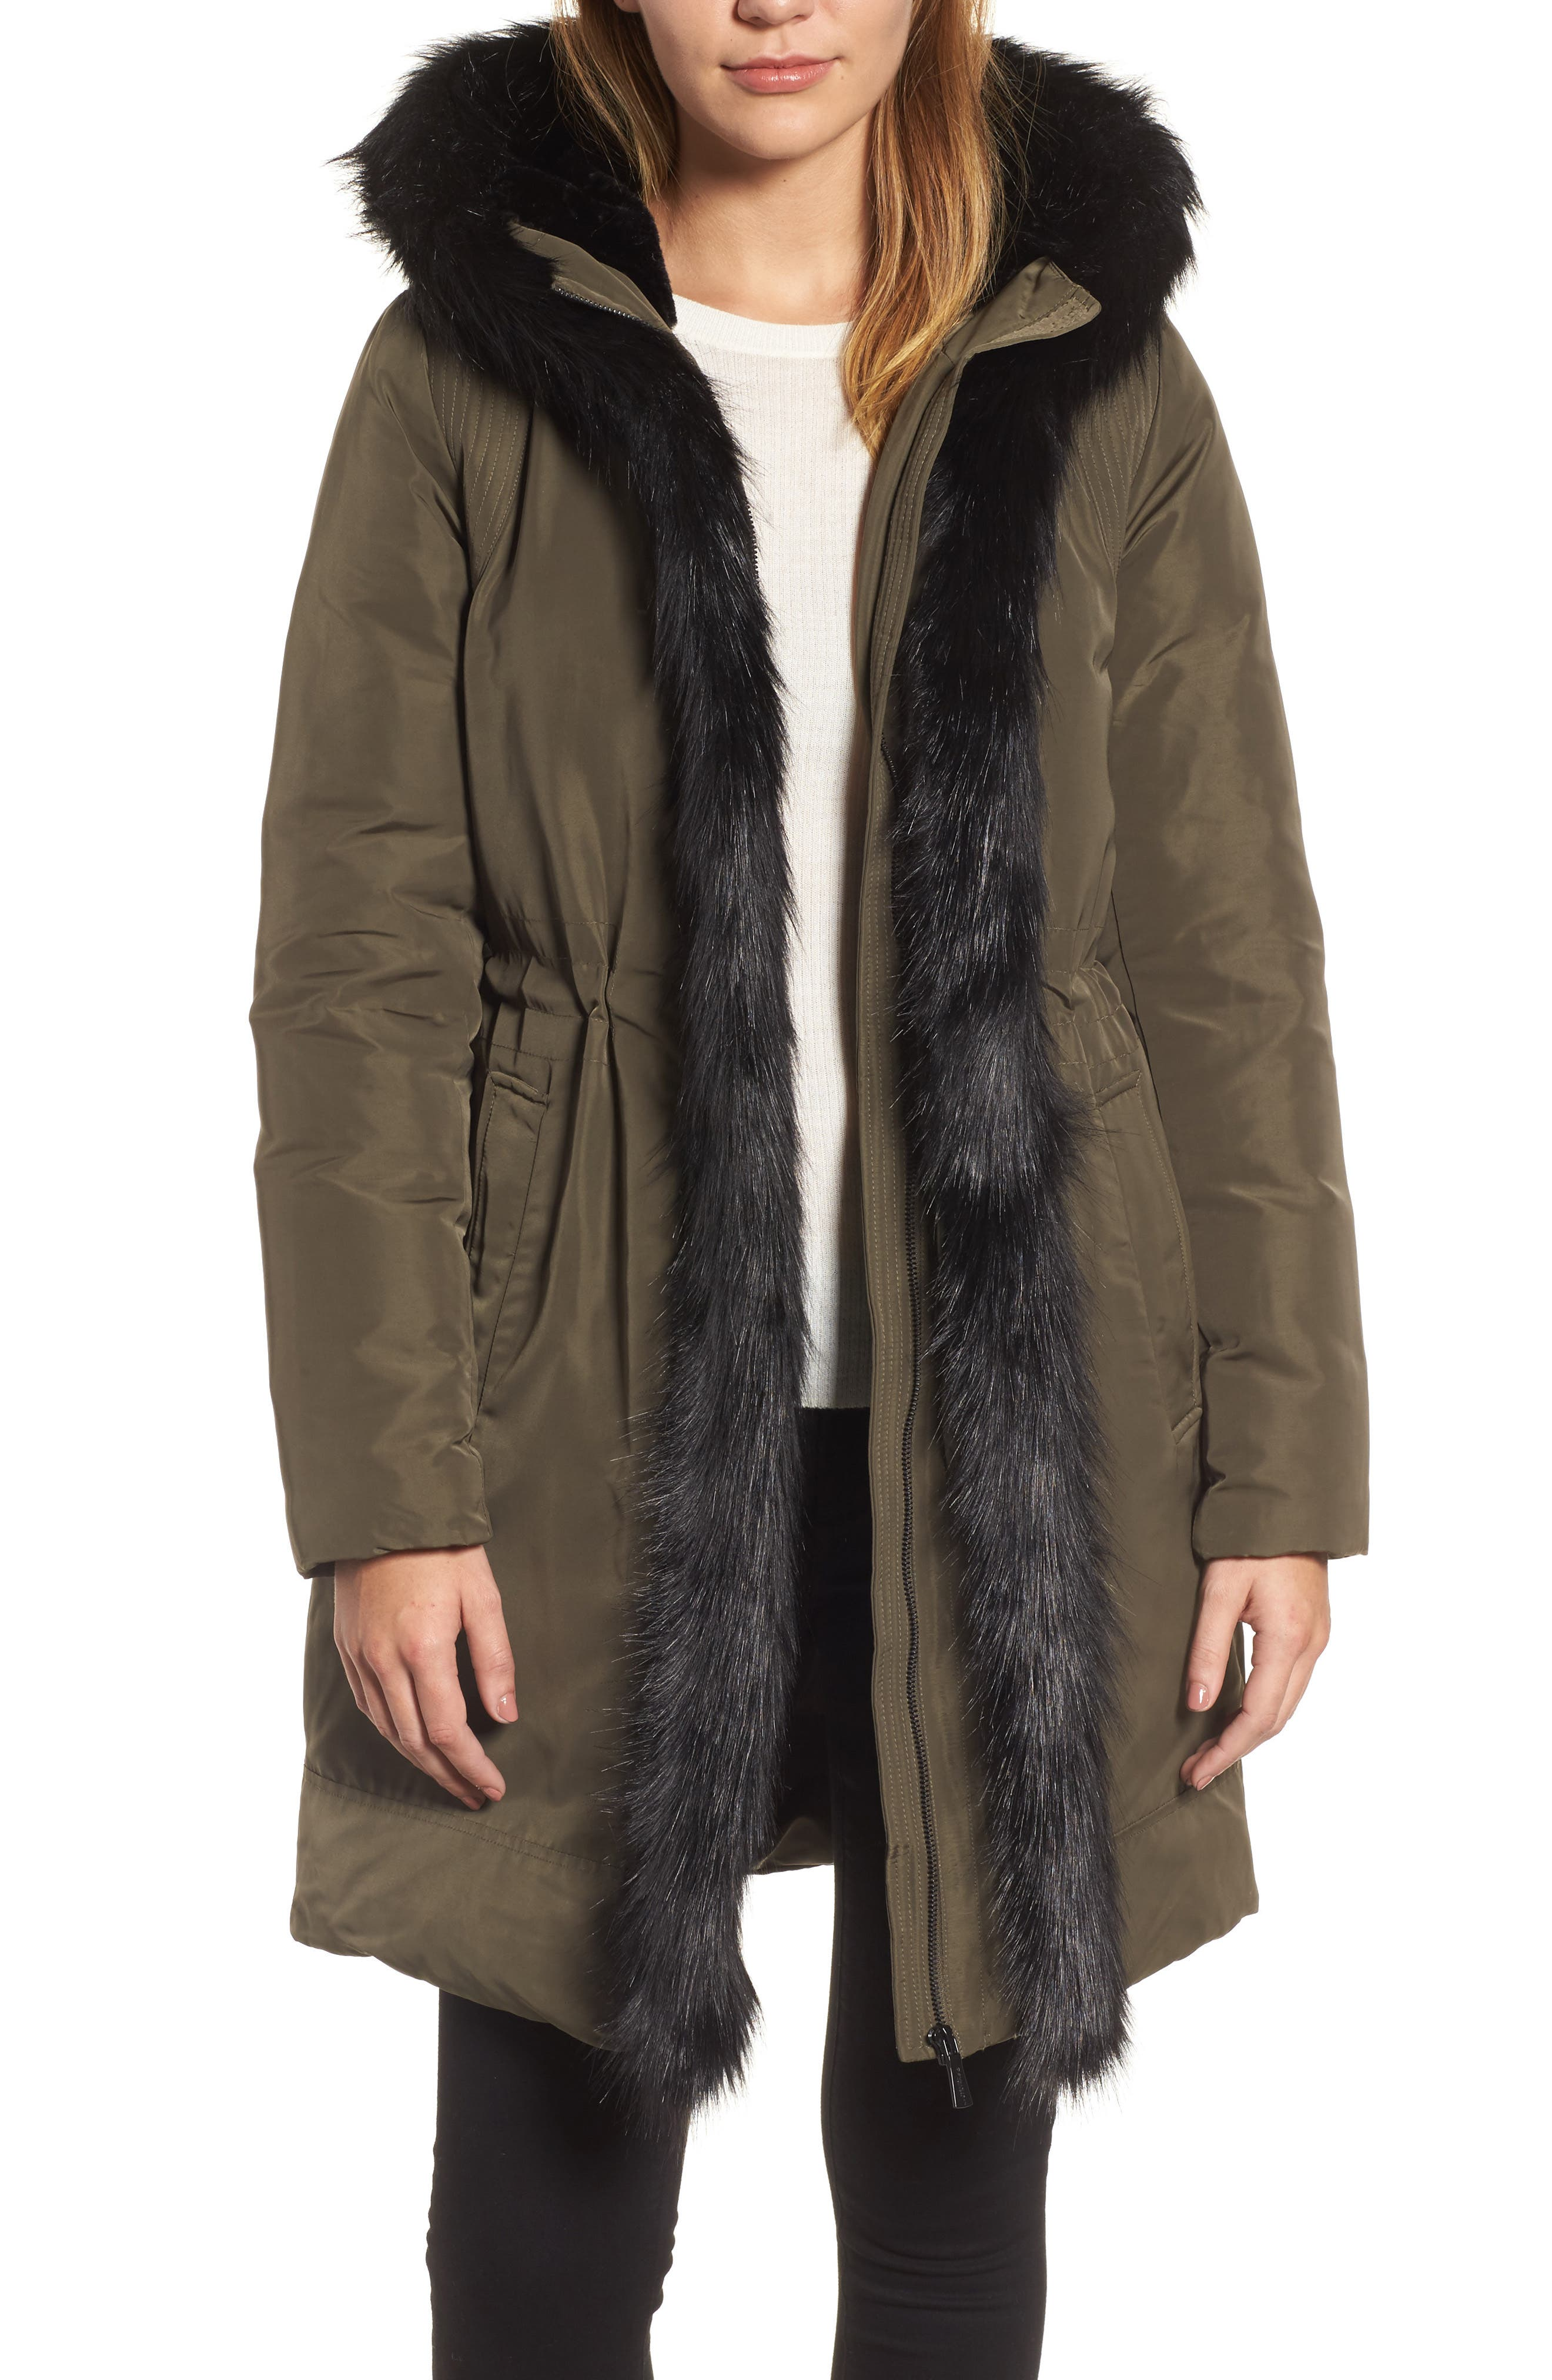 Alternate Image 1 Selected - DKNY Prato Faux Fur Trim Down Parka